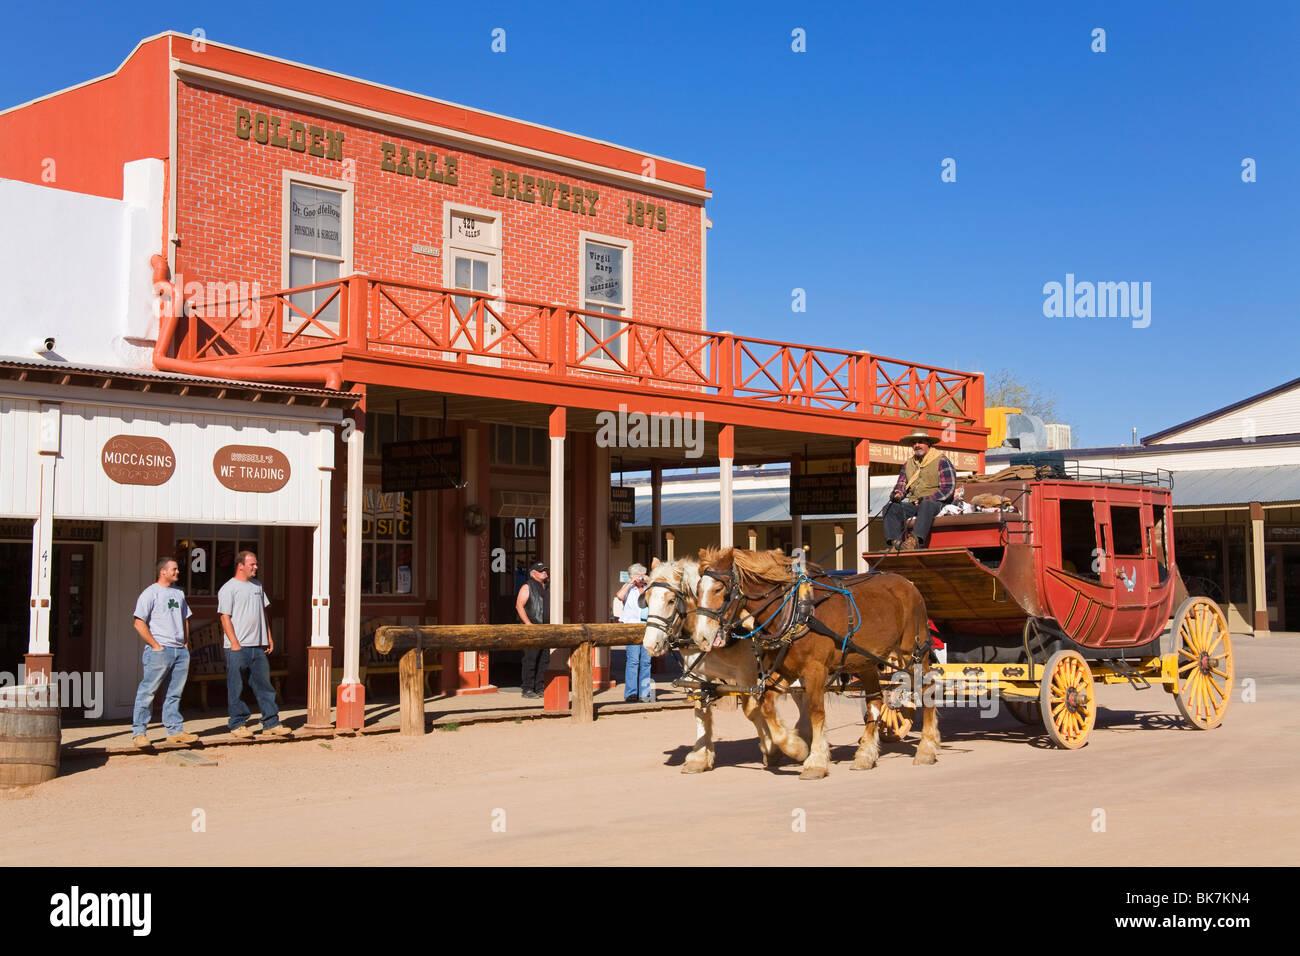 Arizona cochise county cochise - Stagecoach Tombstone Cochise County Arizona United States Of America North America